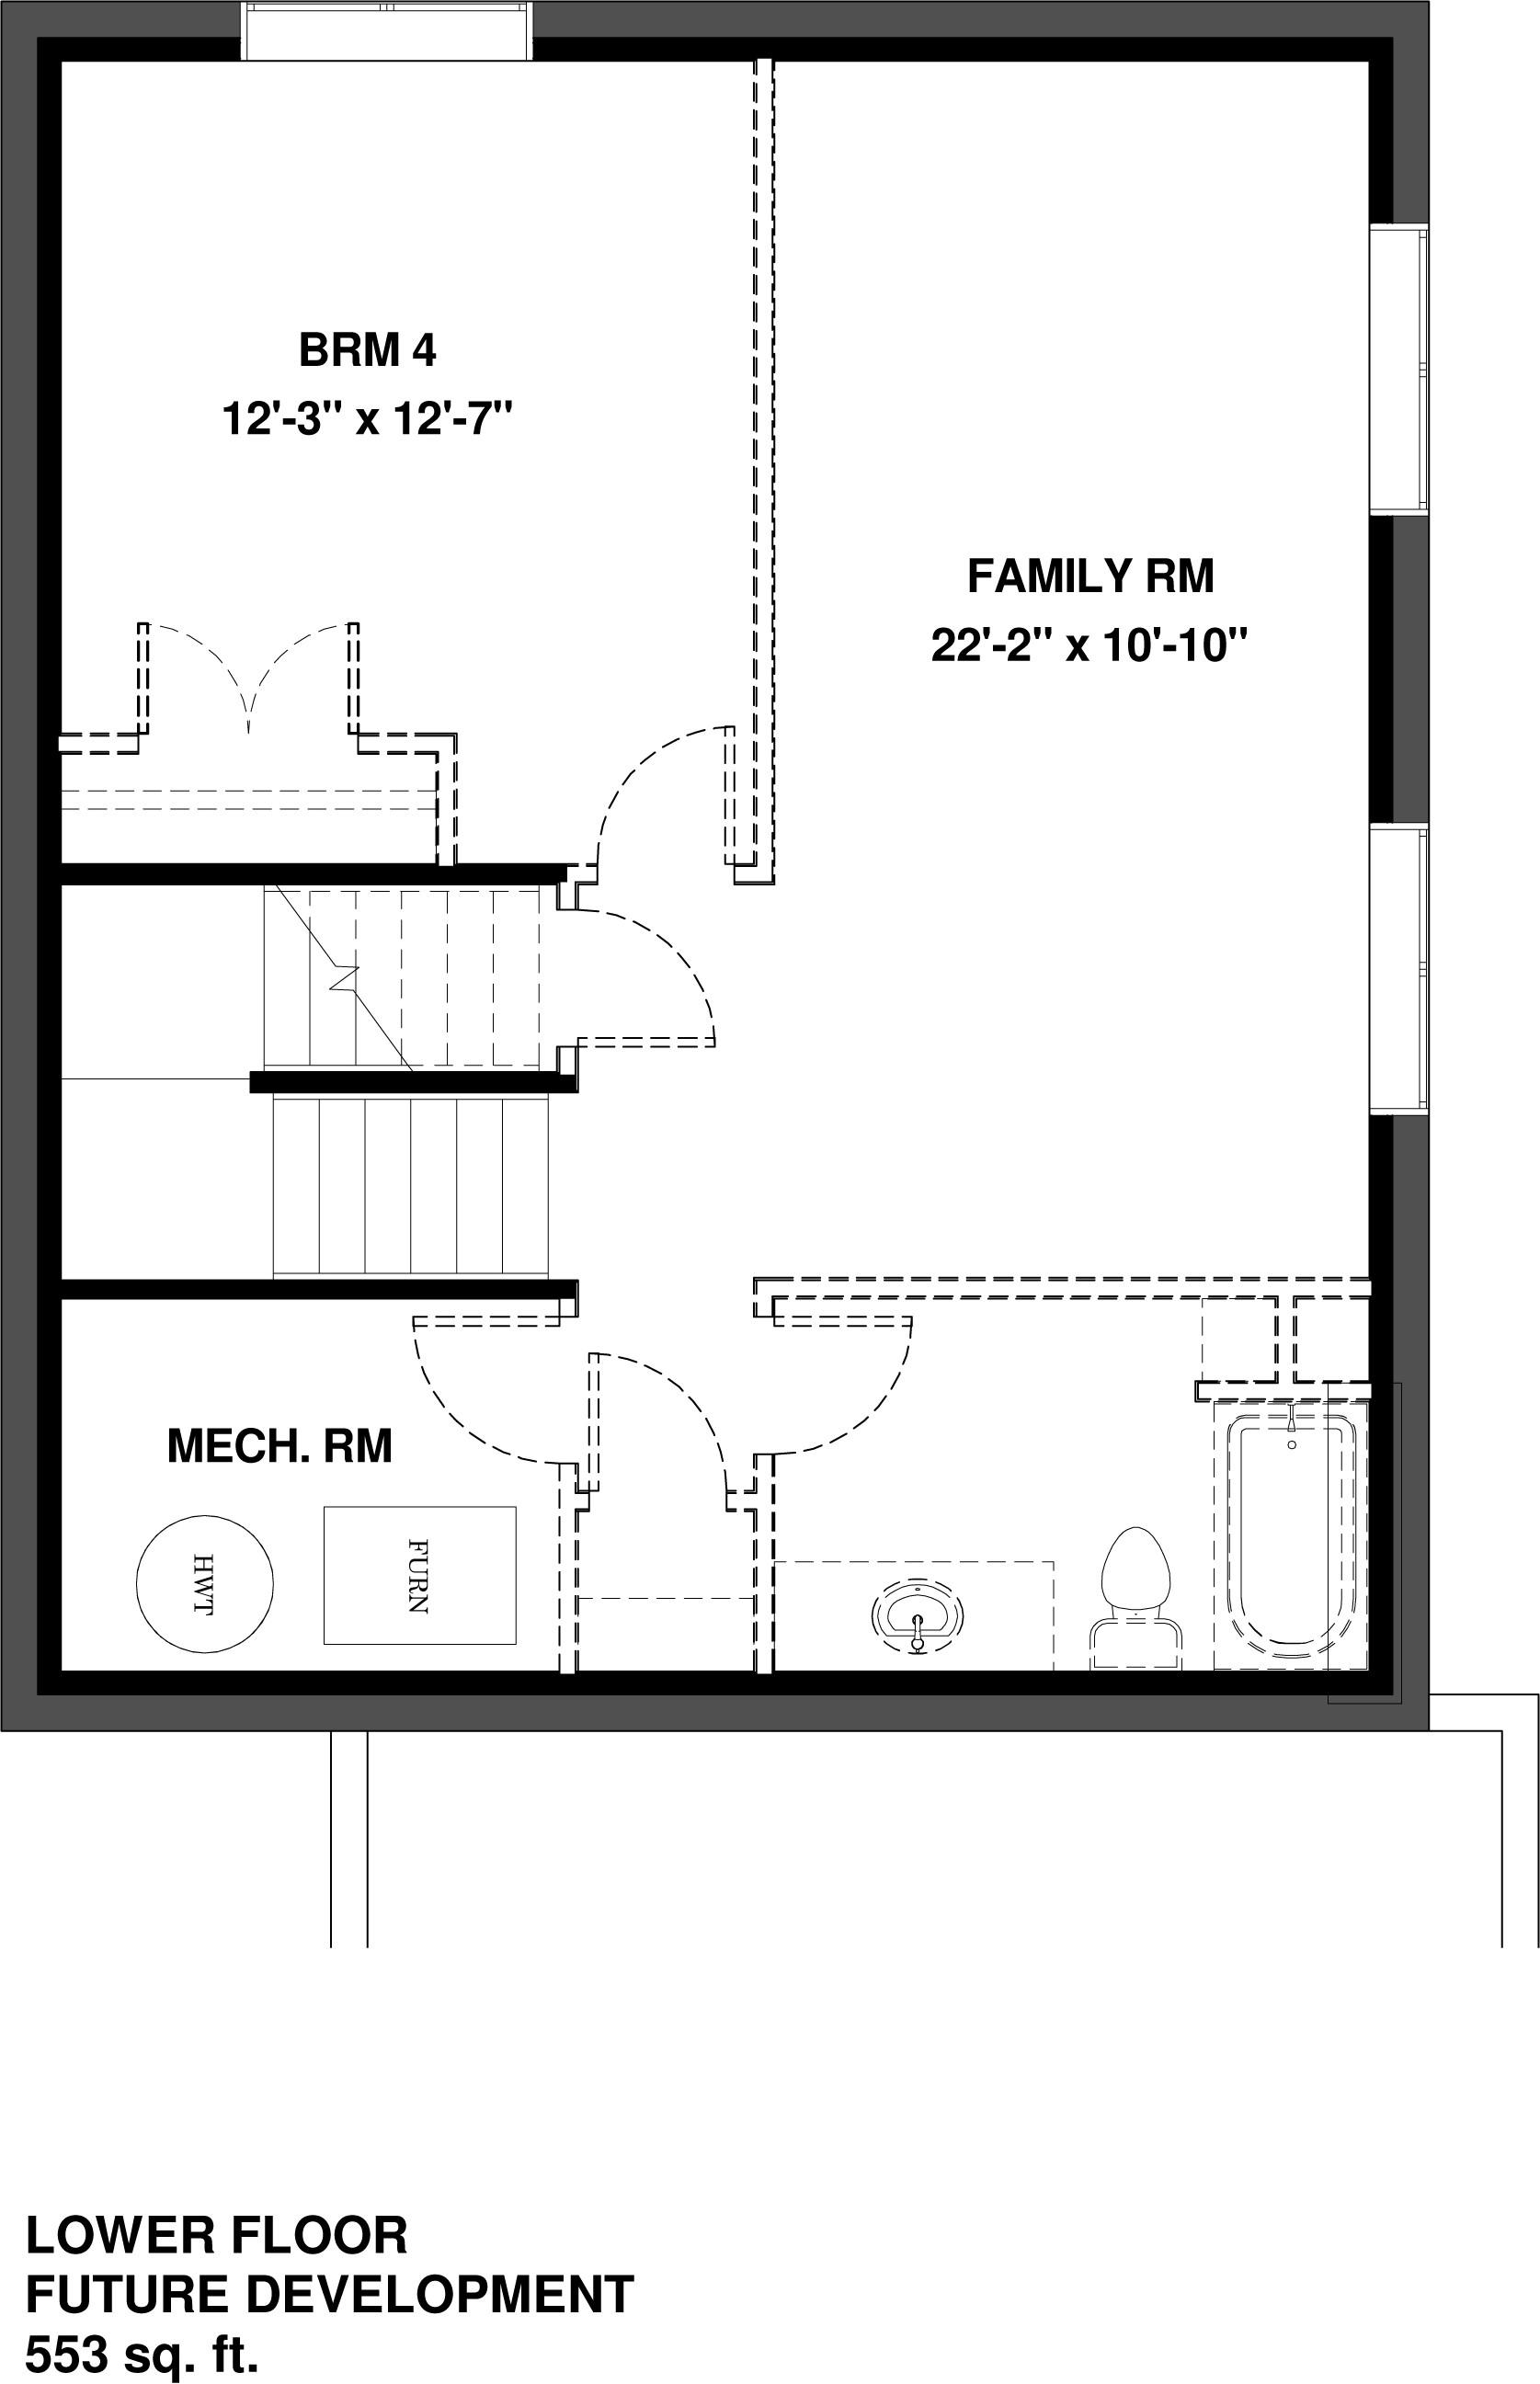 Lower Floor Future Development  553 sq ft